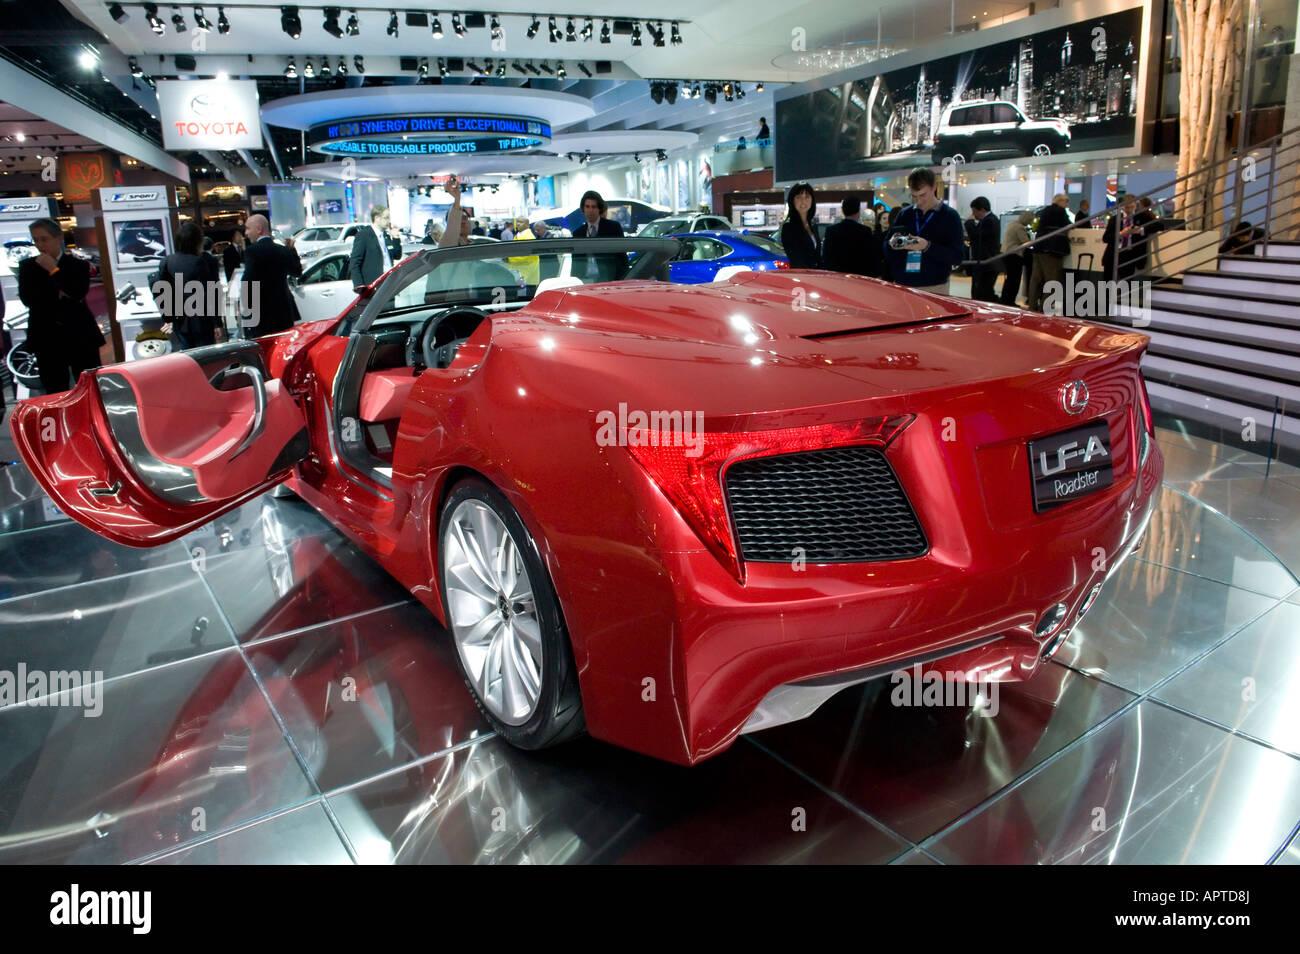 http://c8.alamy.com/comp/APTD8J/lexus-lf-a-roadster-concept-car-at-the-2008-north-american-international-APTD8J.jpg